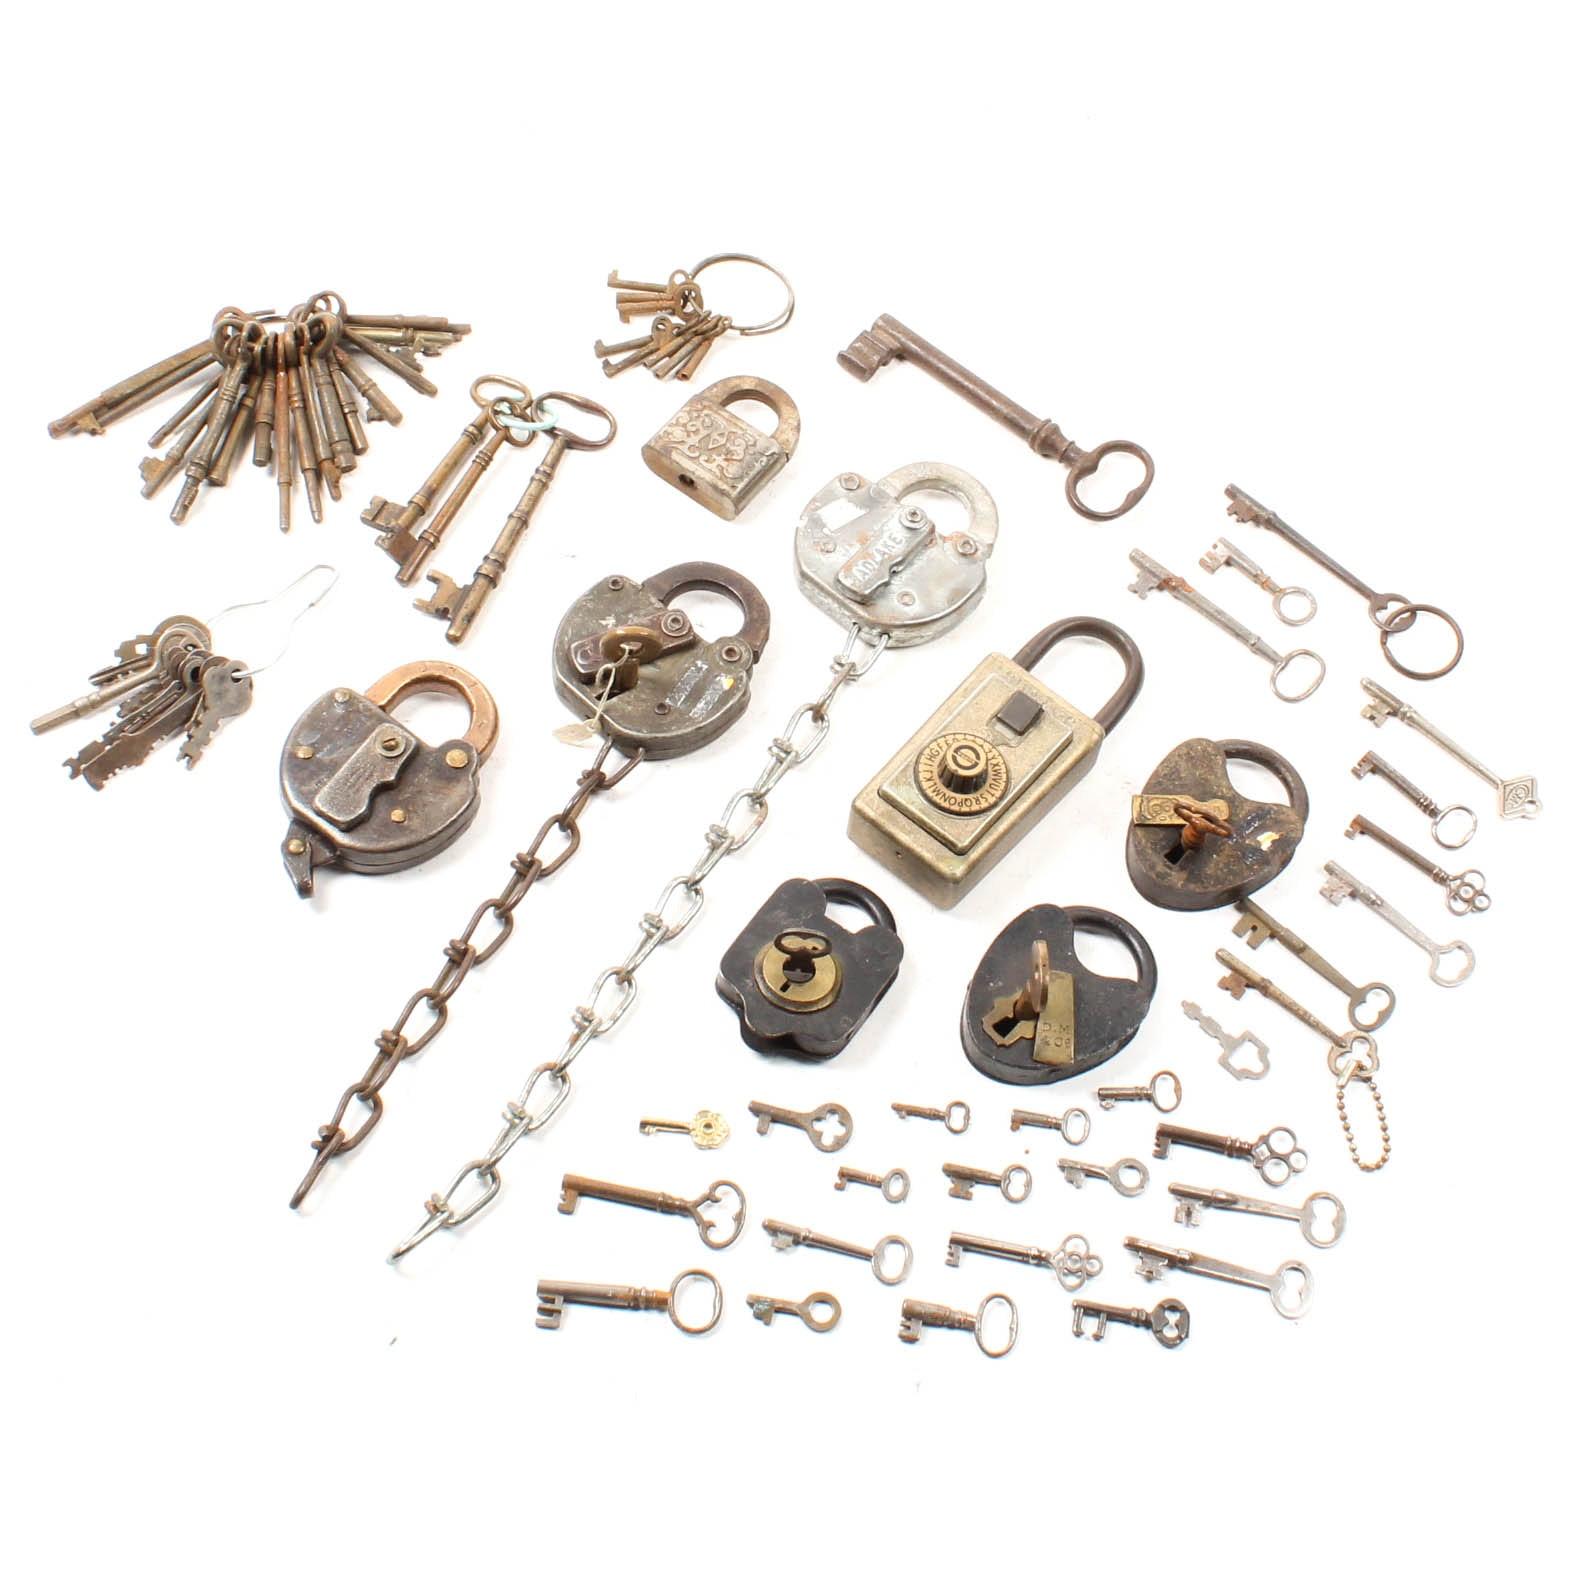 Antique and Vintage Padlocks and Keys